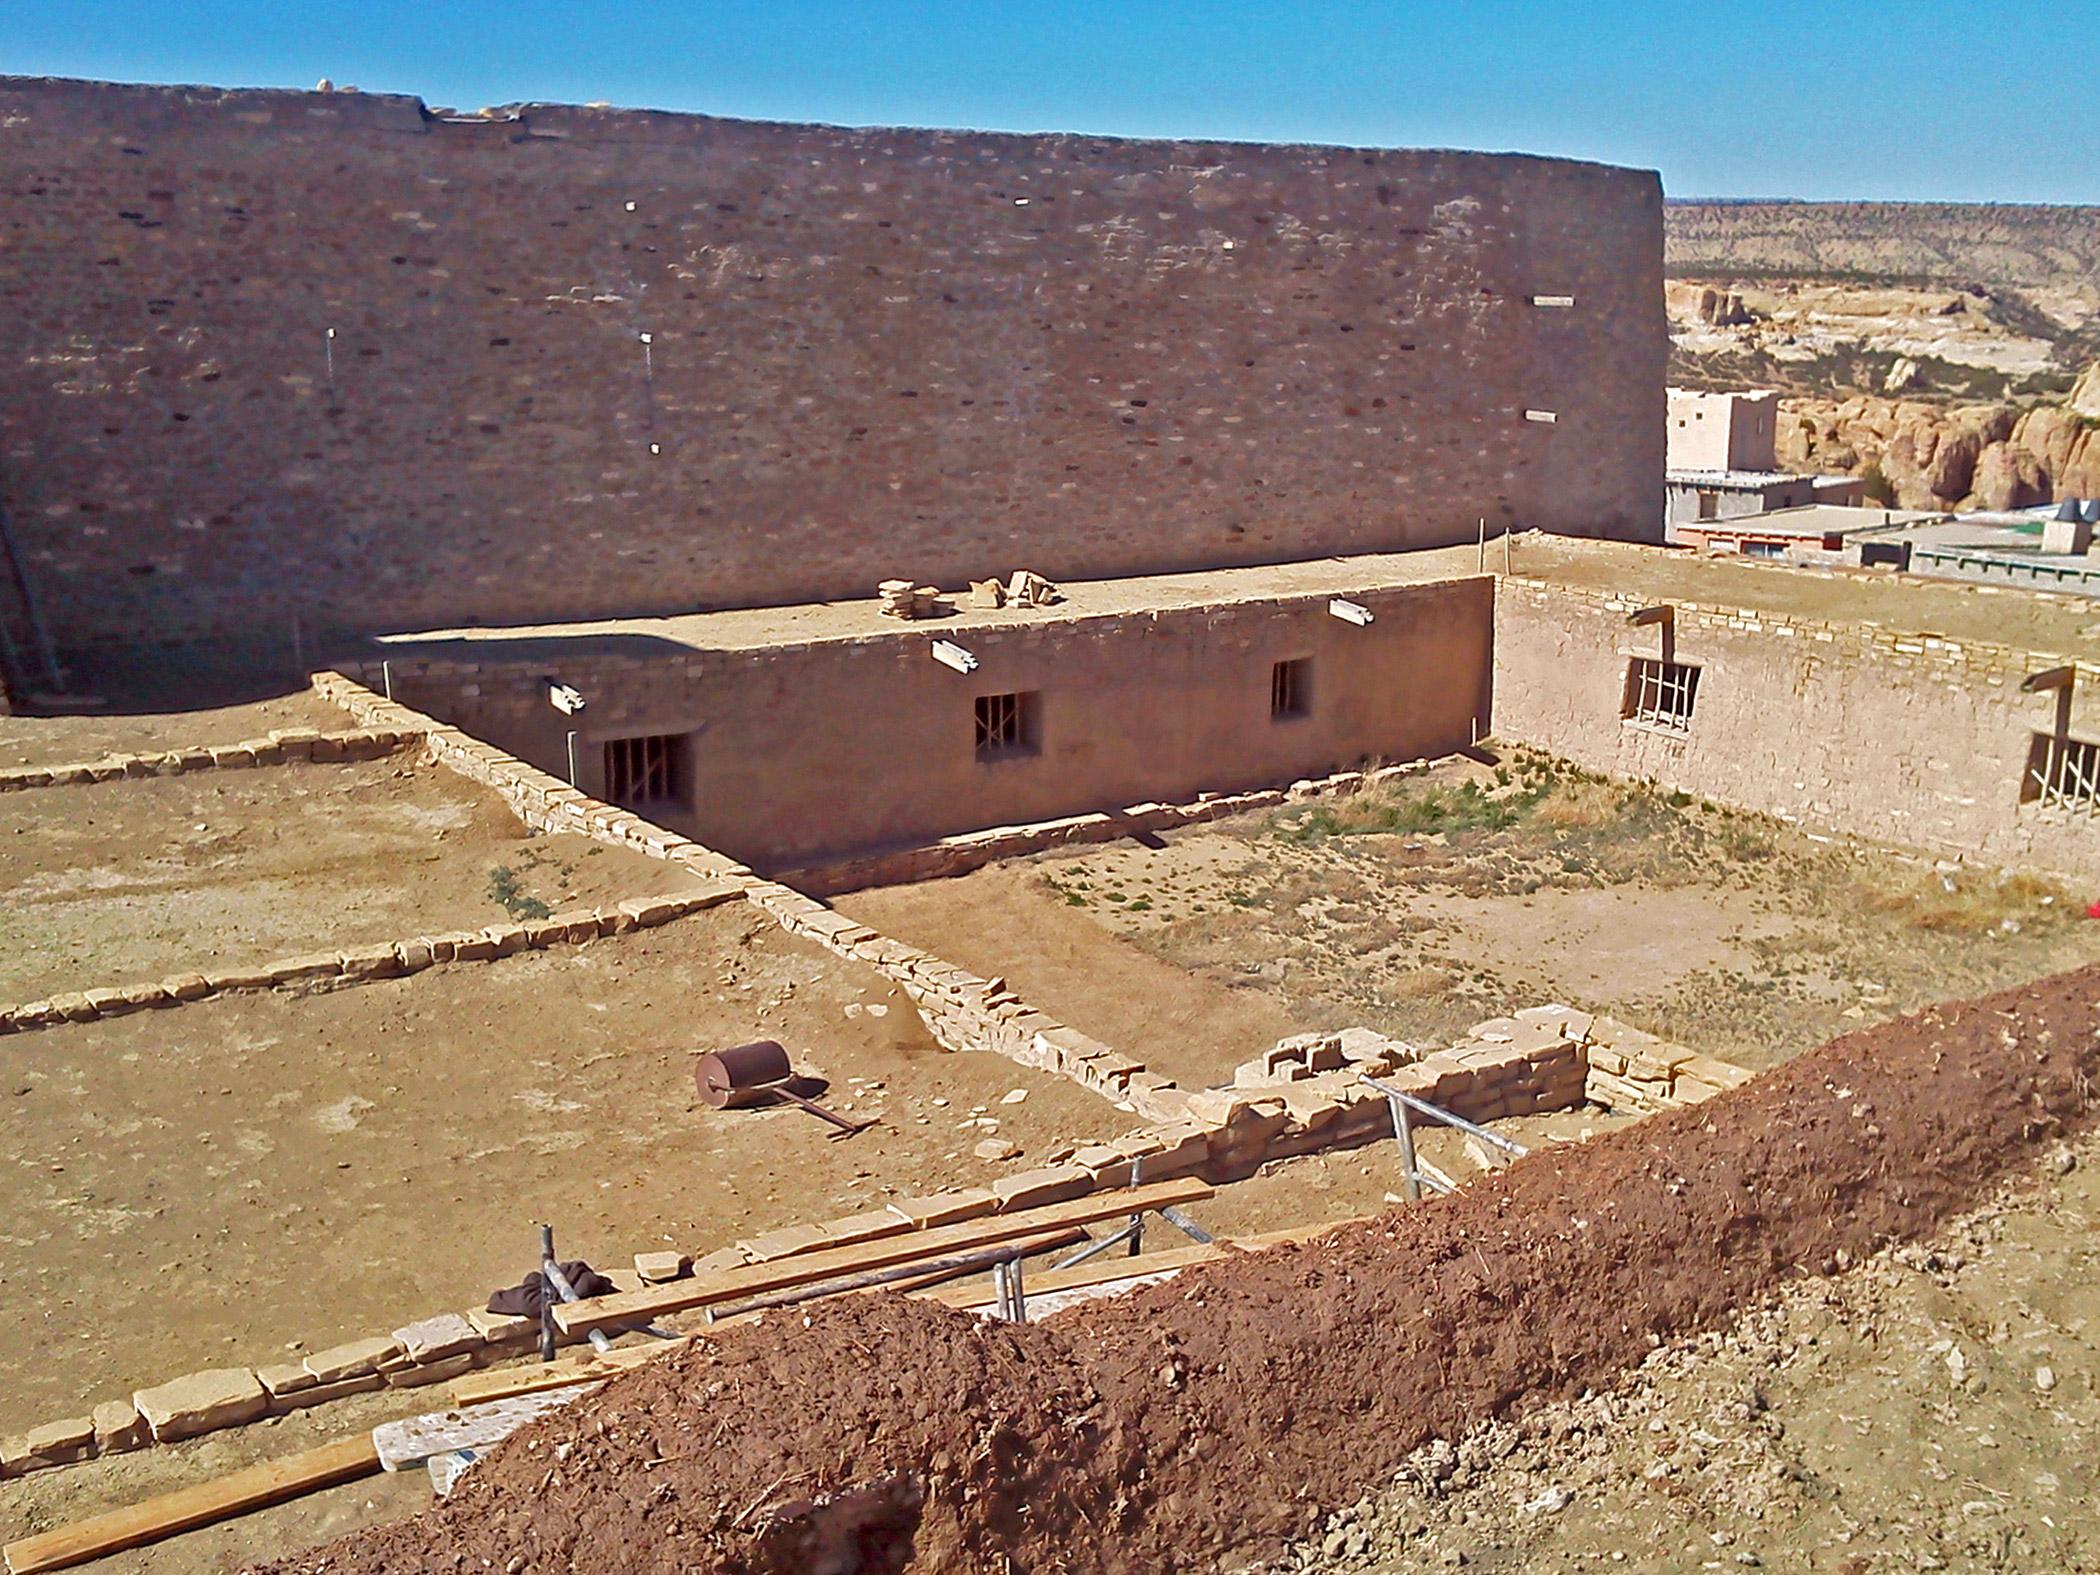 United States, San                               Esteban del Rey                               Mission: A comprehensive restoration program for the San Esteban del Rey Mission requires investment and remains long overdue.